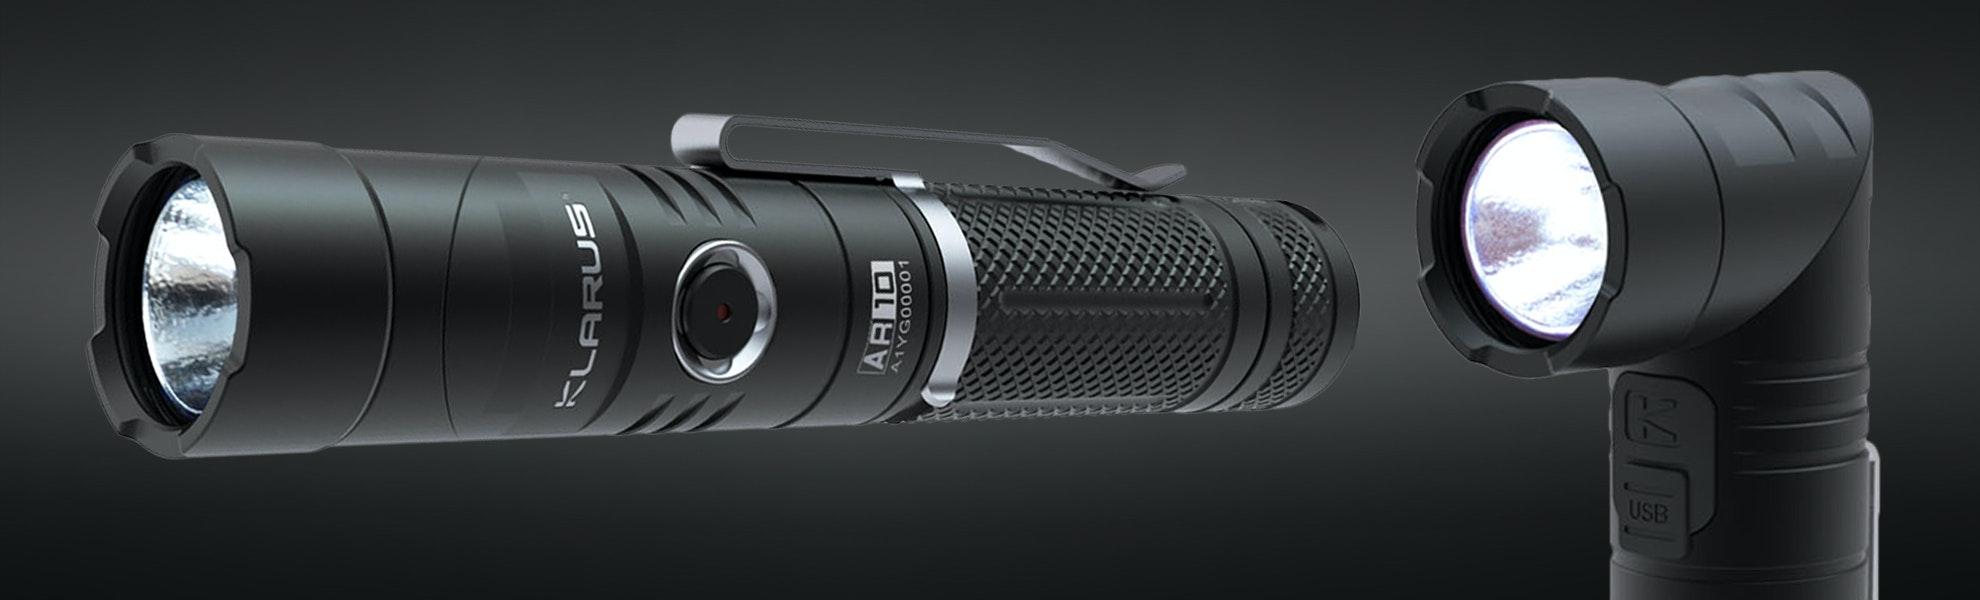 Klarus AR10 Swivel-Head Flashlight w/Magnetic Tail